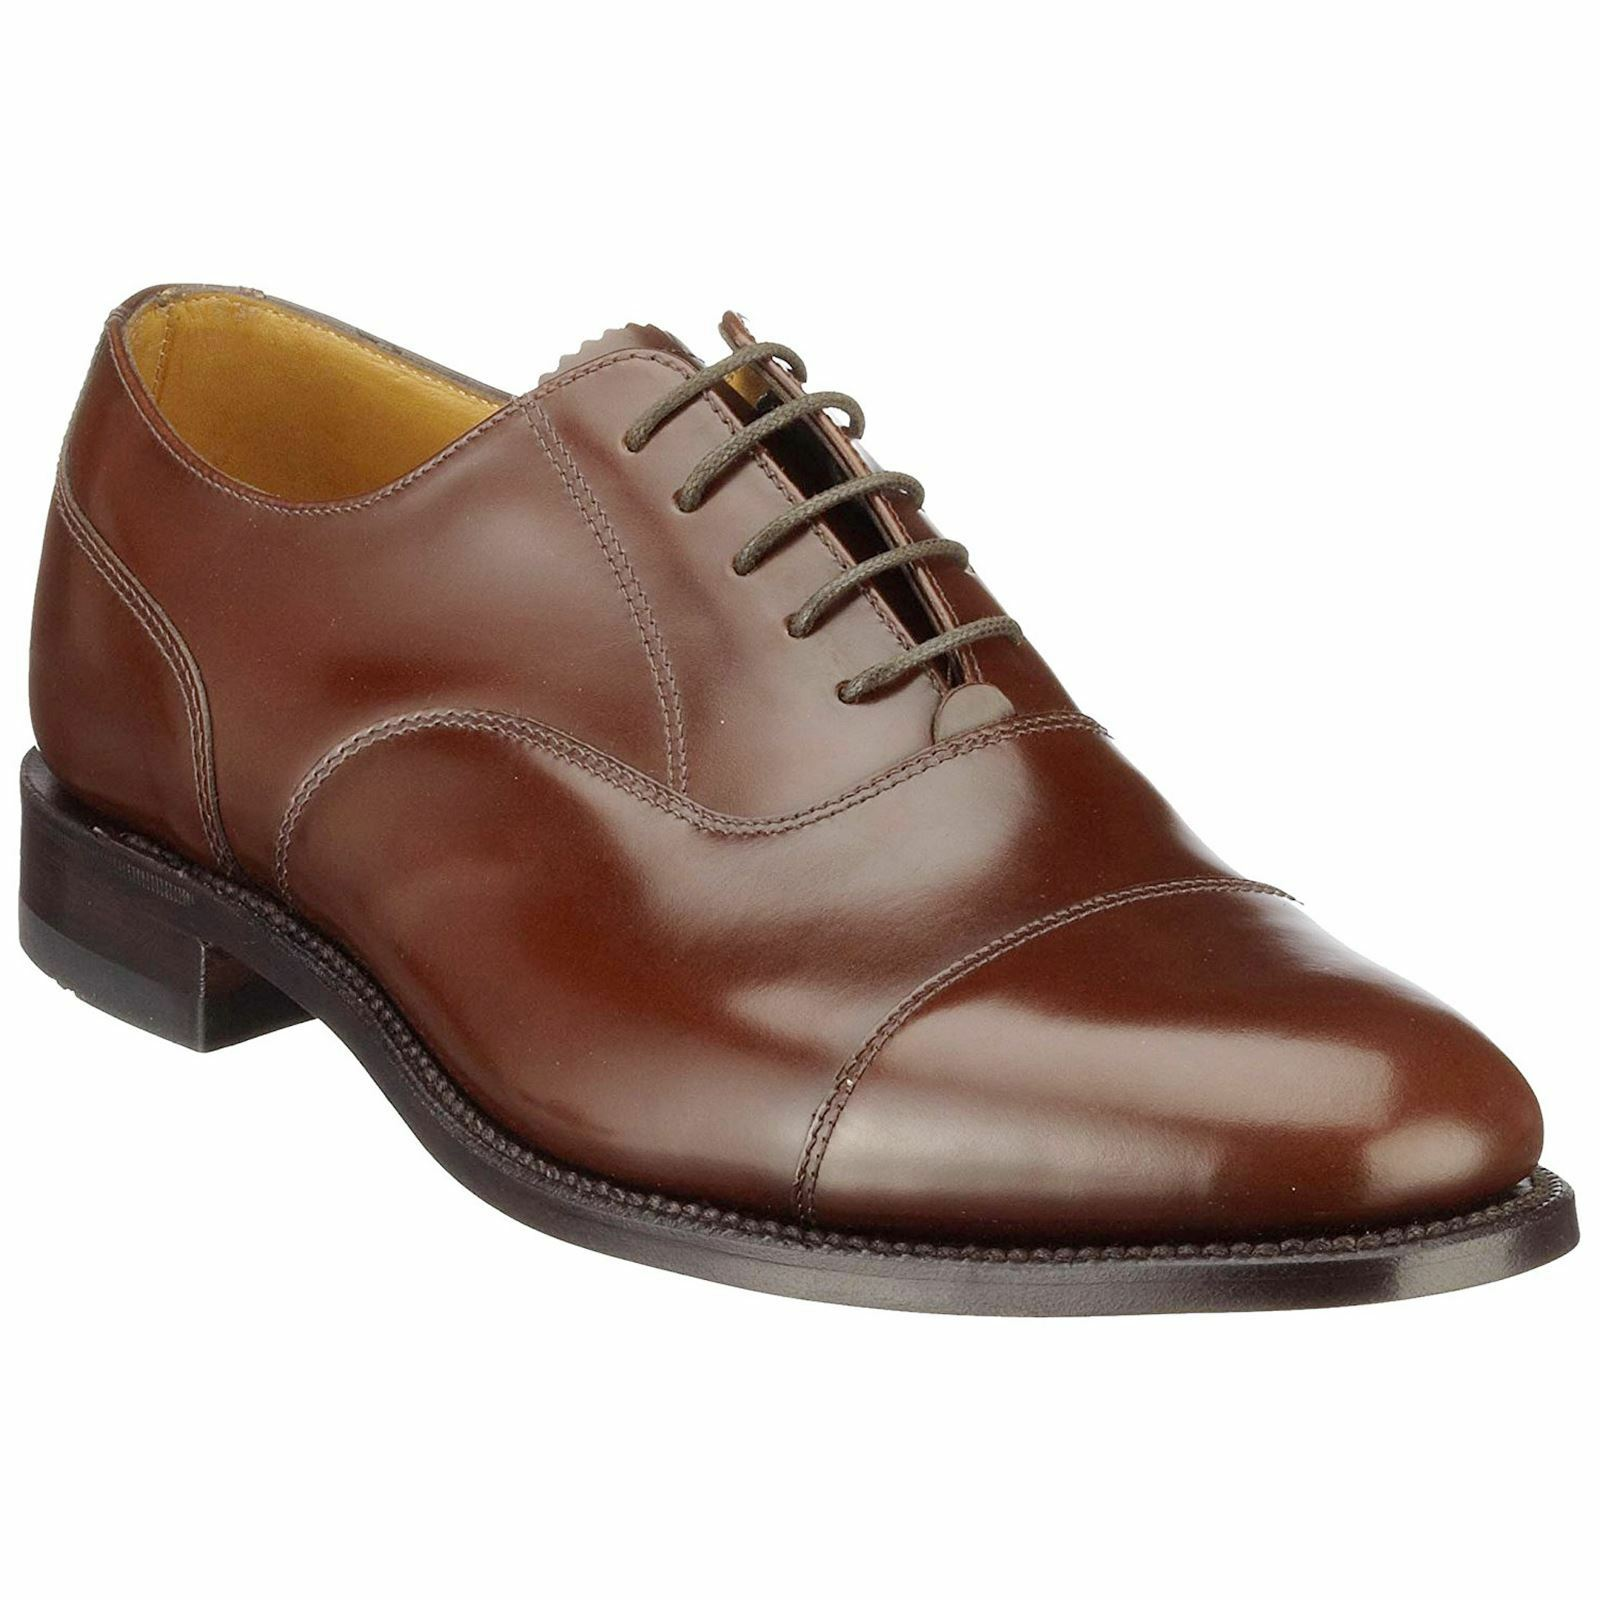 Loake 200 Braun Mens Leder Oxford Formal Smart Lace-up Schuhes